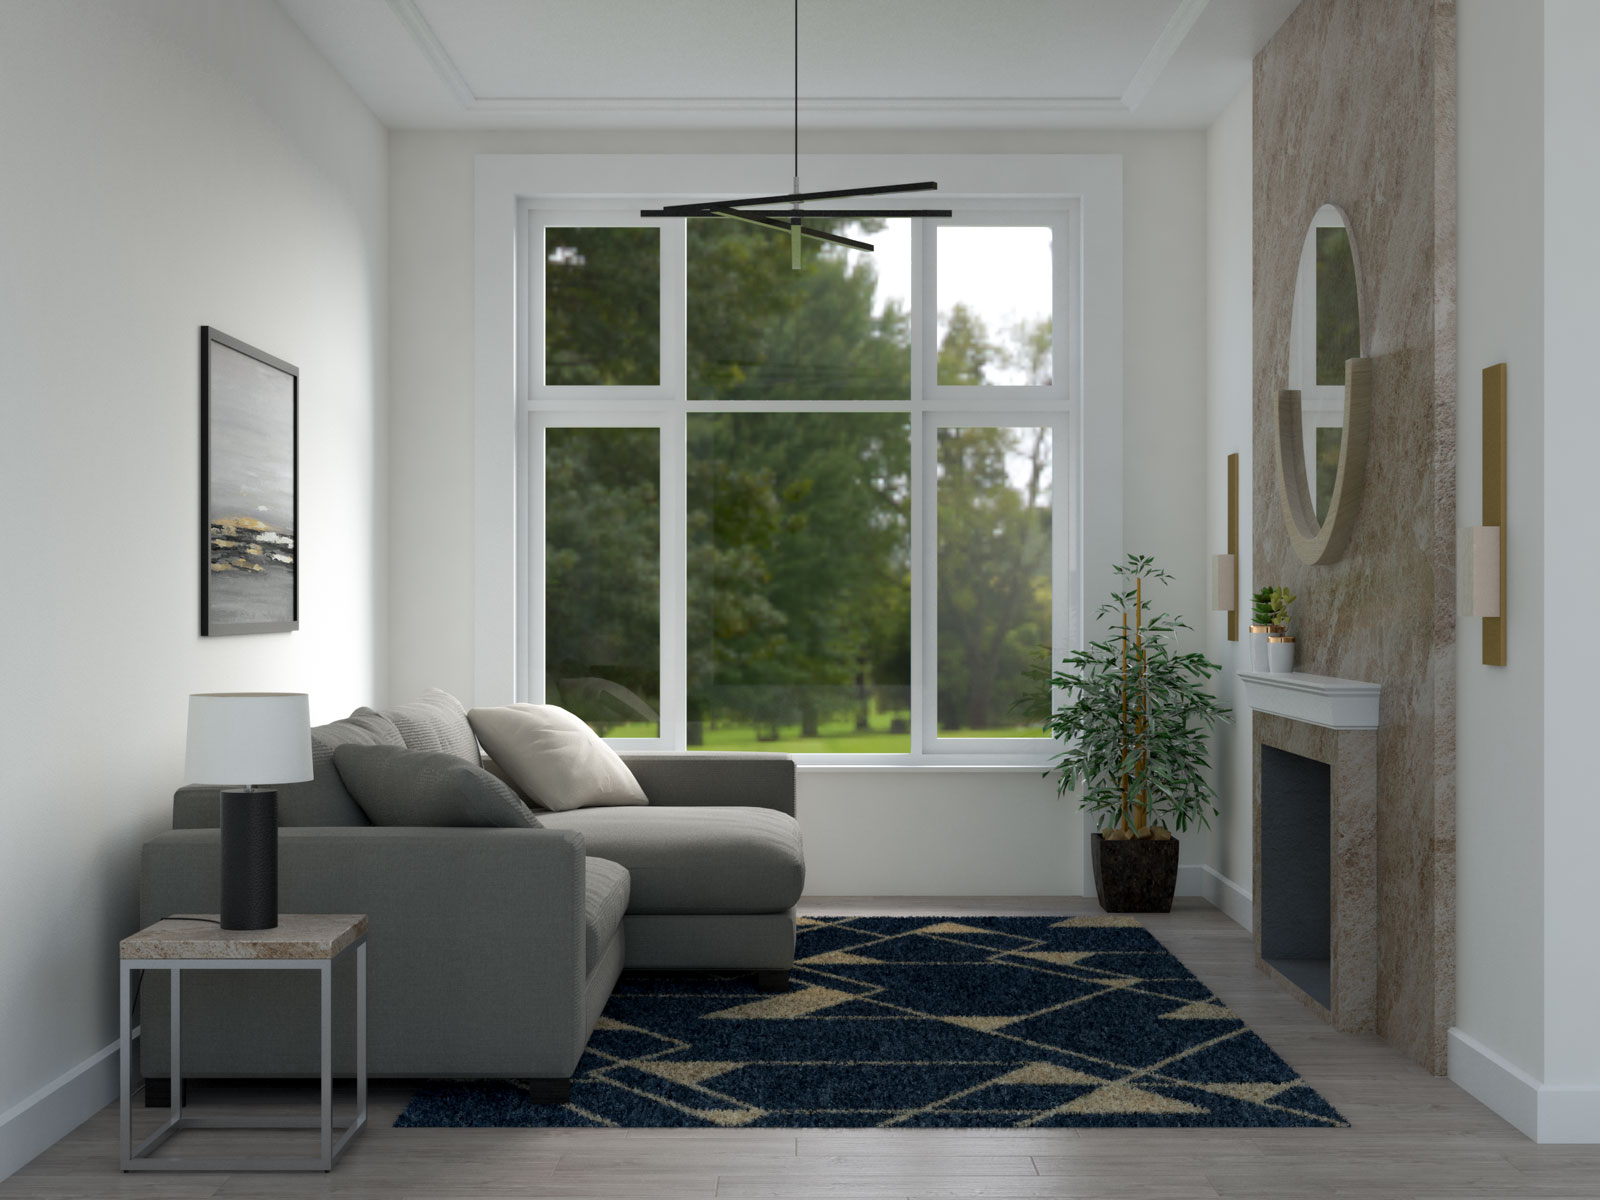 Navy random geometric rug for small spaces